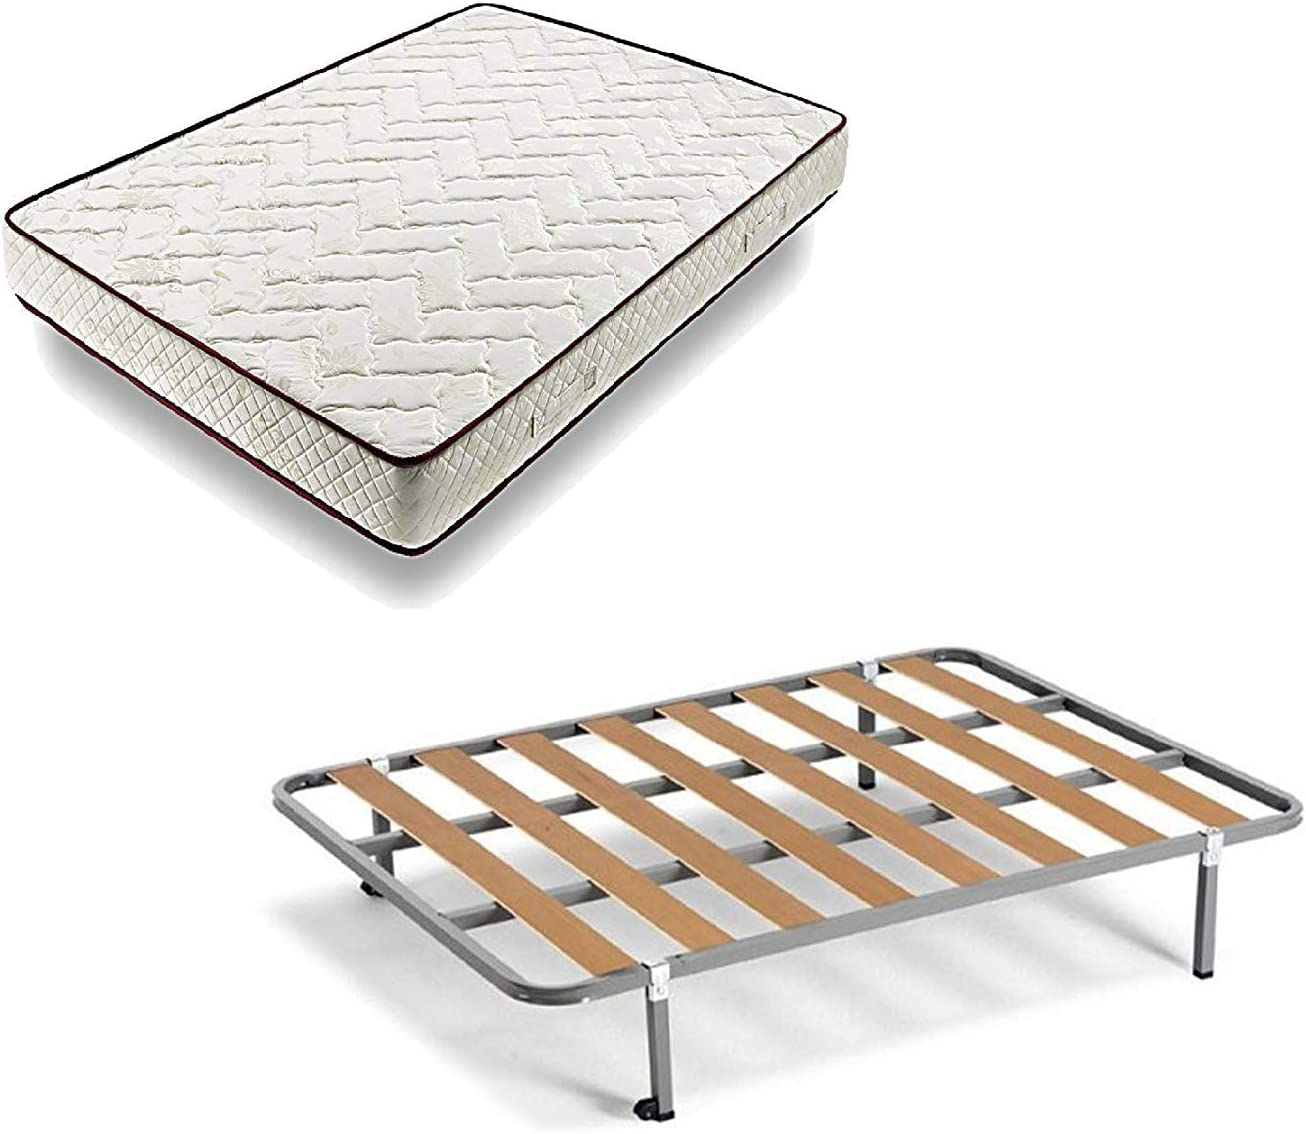 HOGAR24 ES Cama Completa - Colchón Flexitex + Somier Basic + 4 Patas de 32cm, 90x180 cm